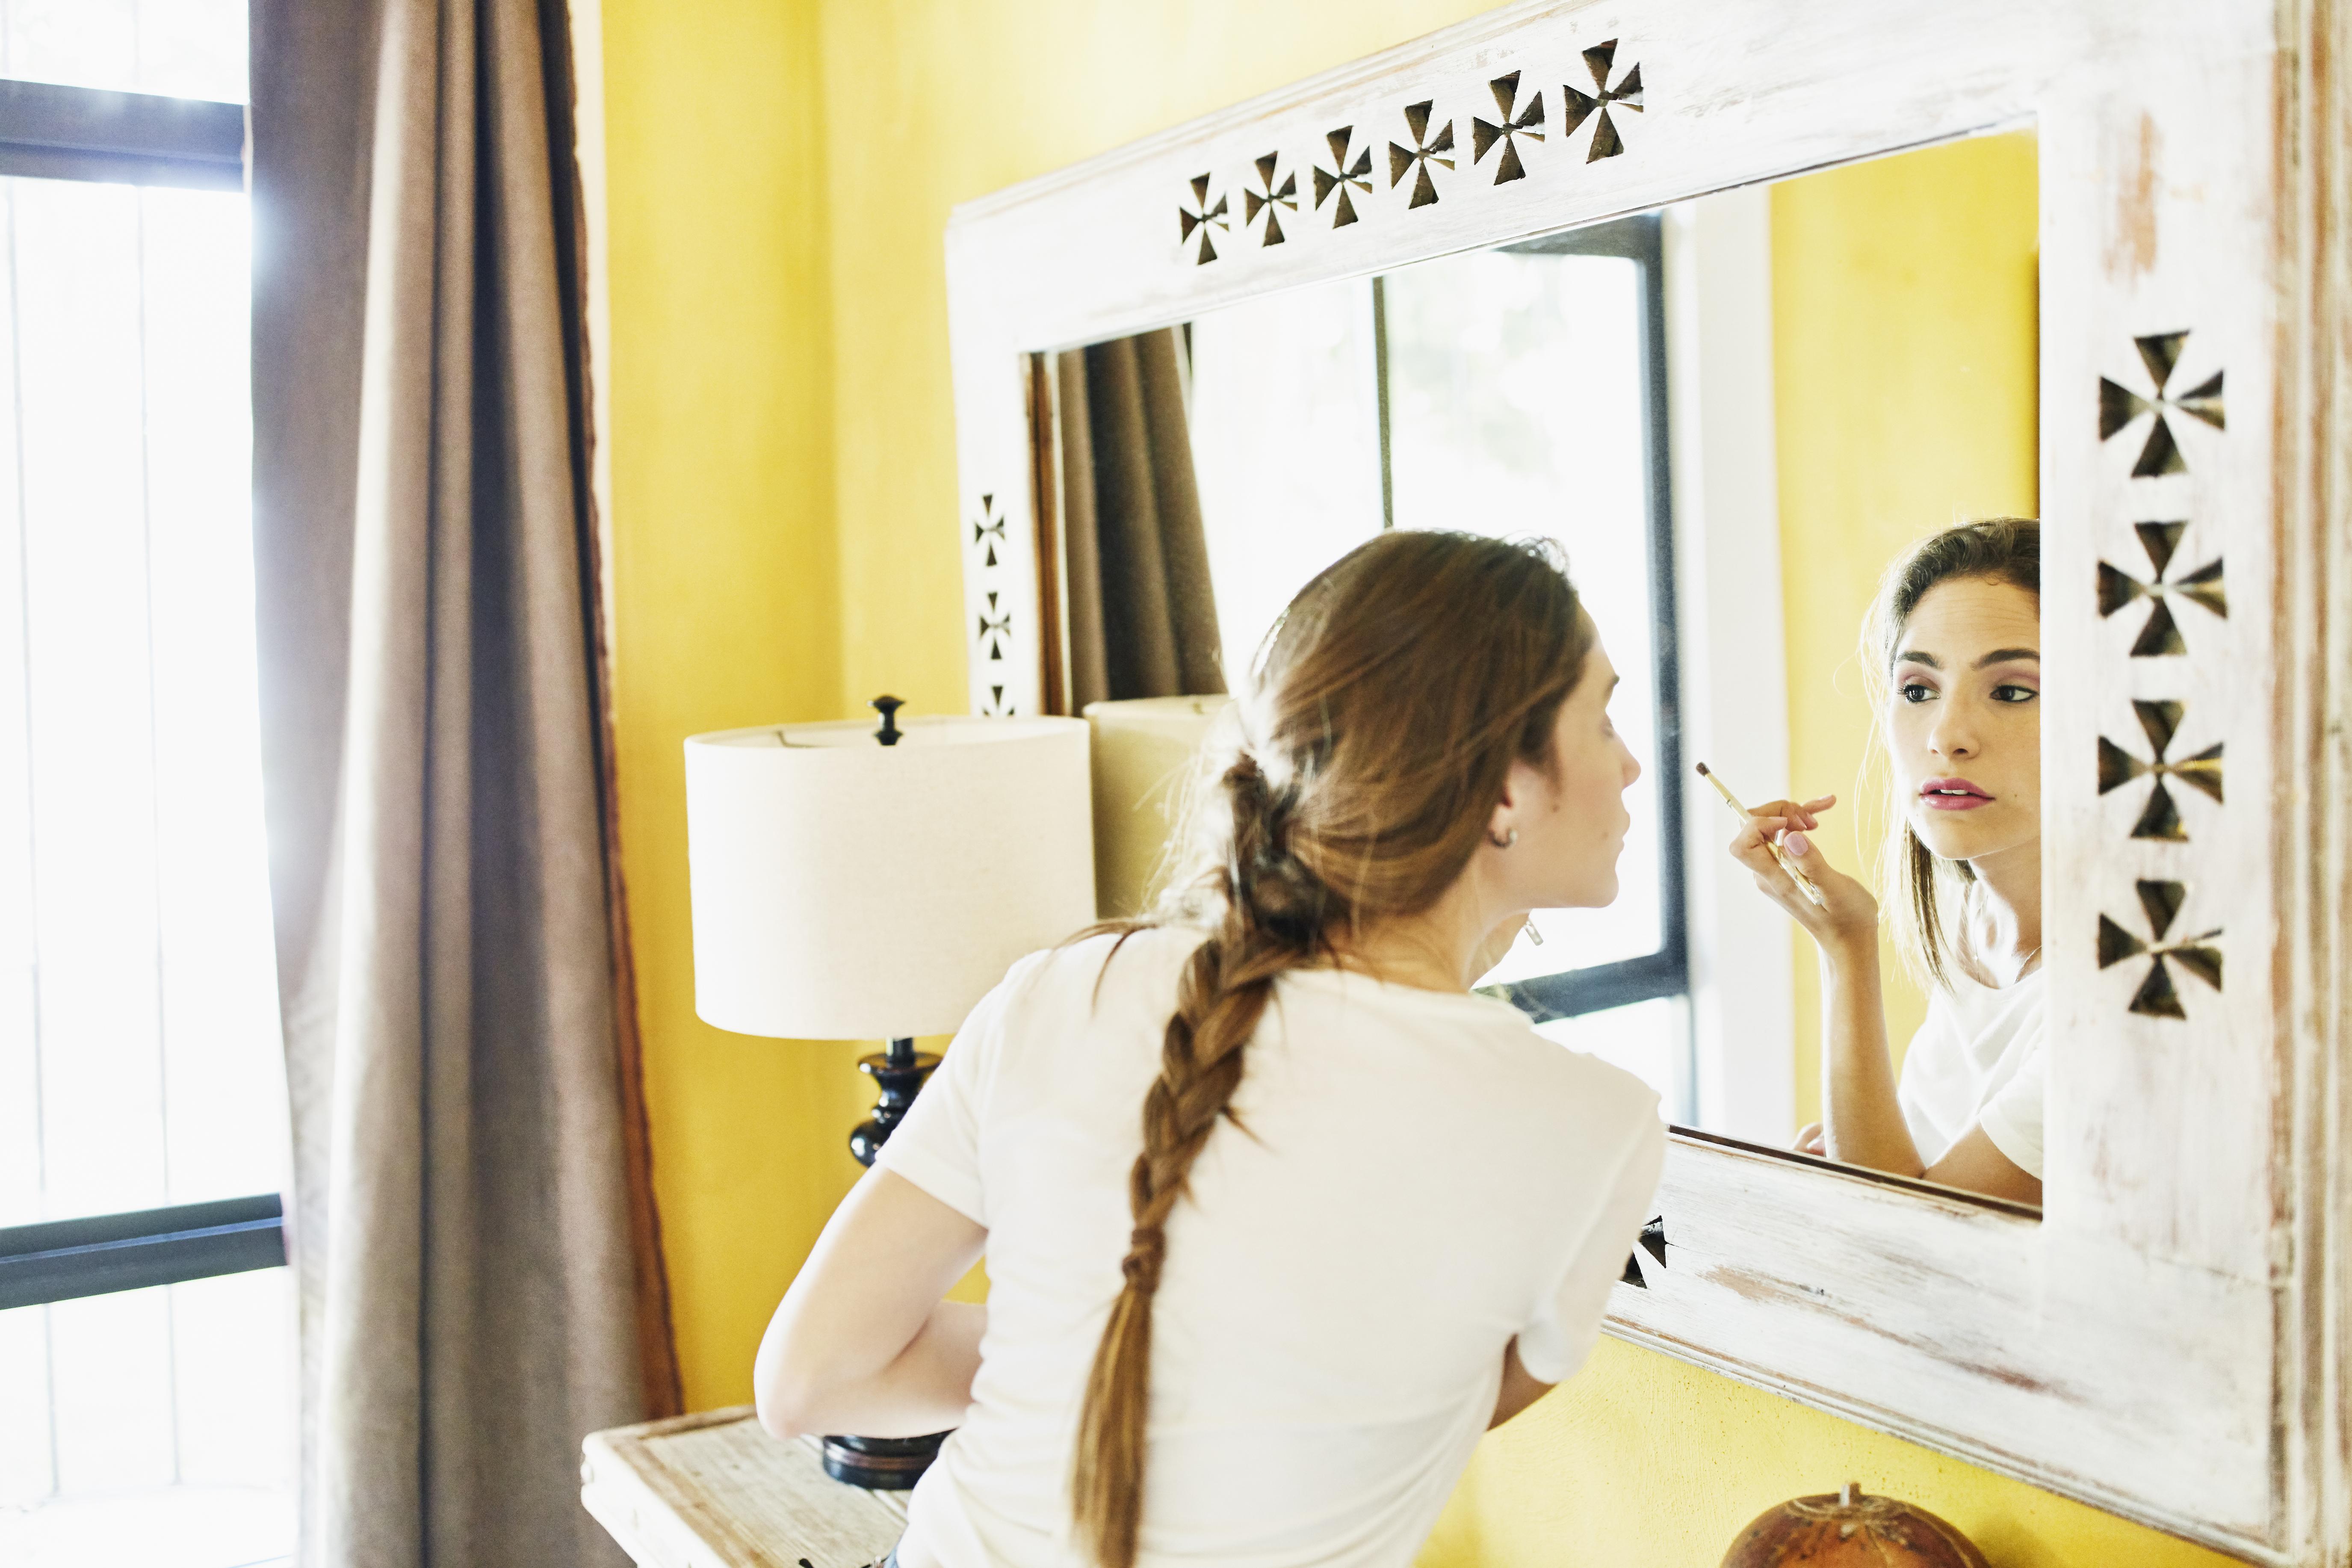 Bride looking in mirror and applying makeup in hotel room before wedding ceremony